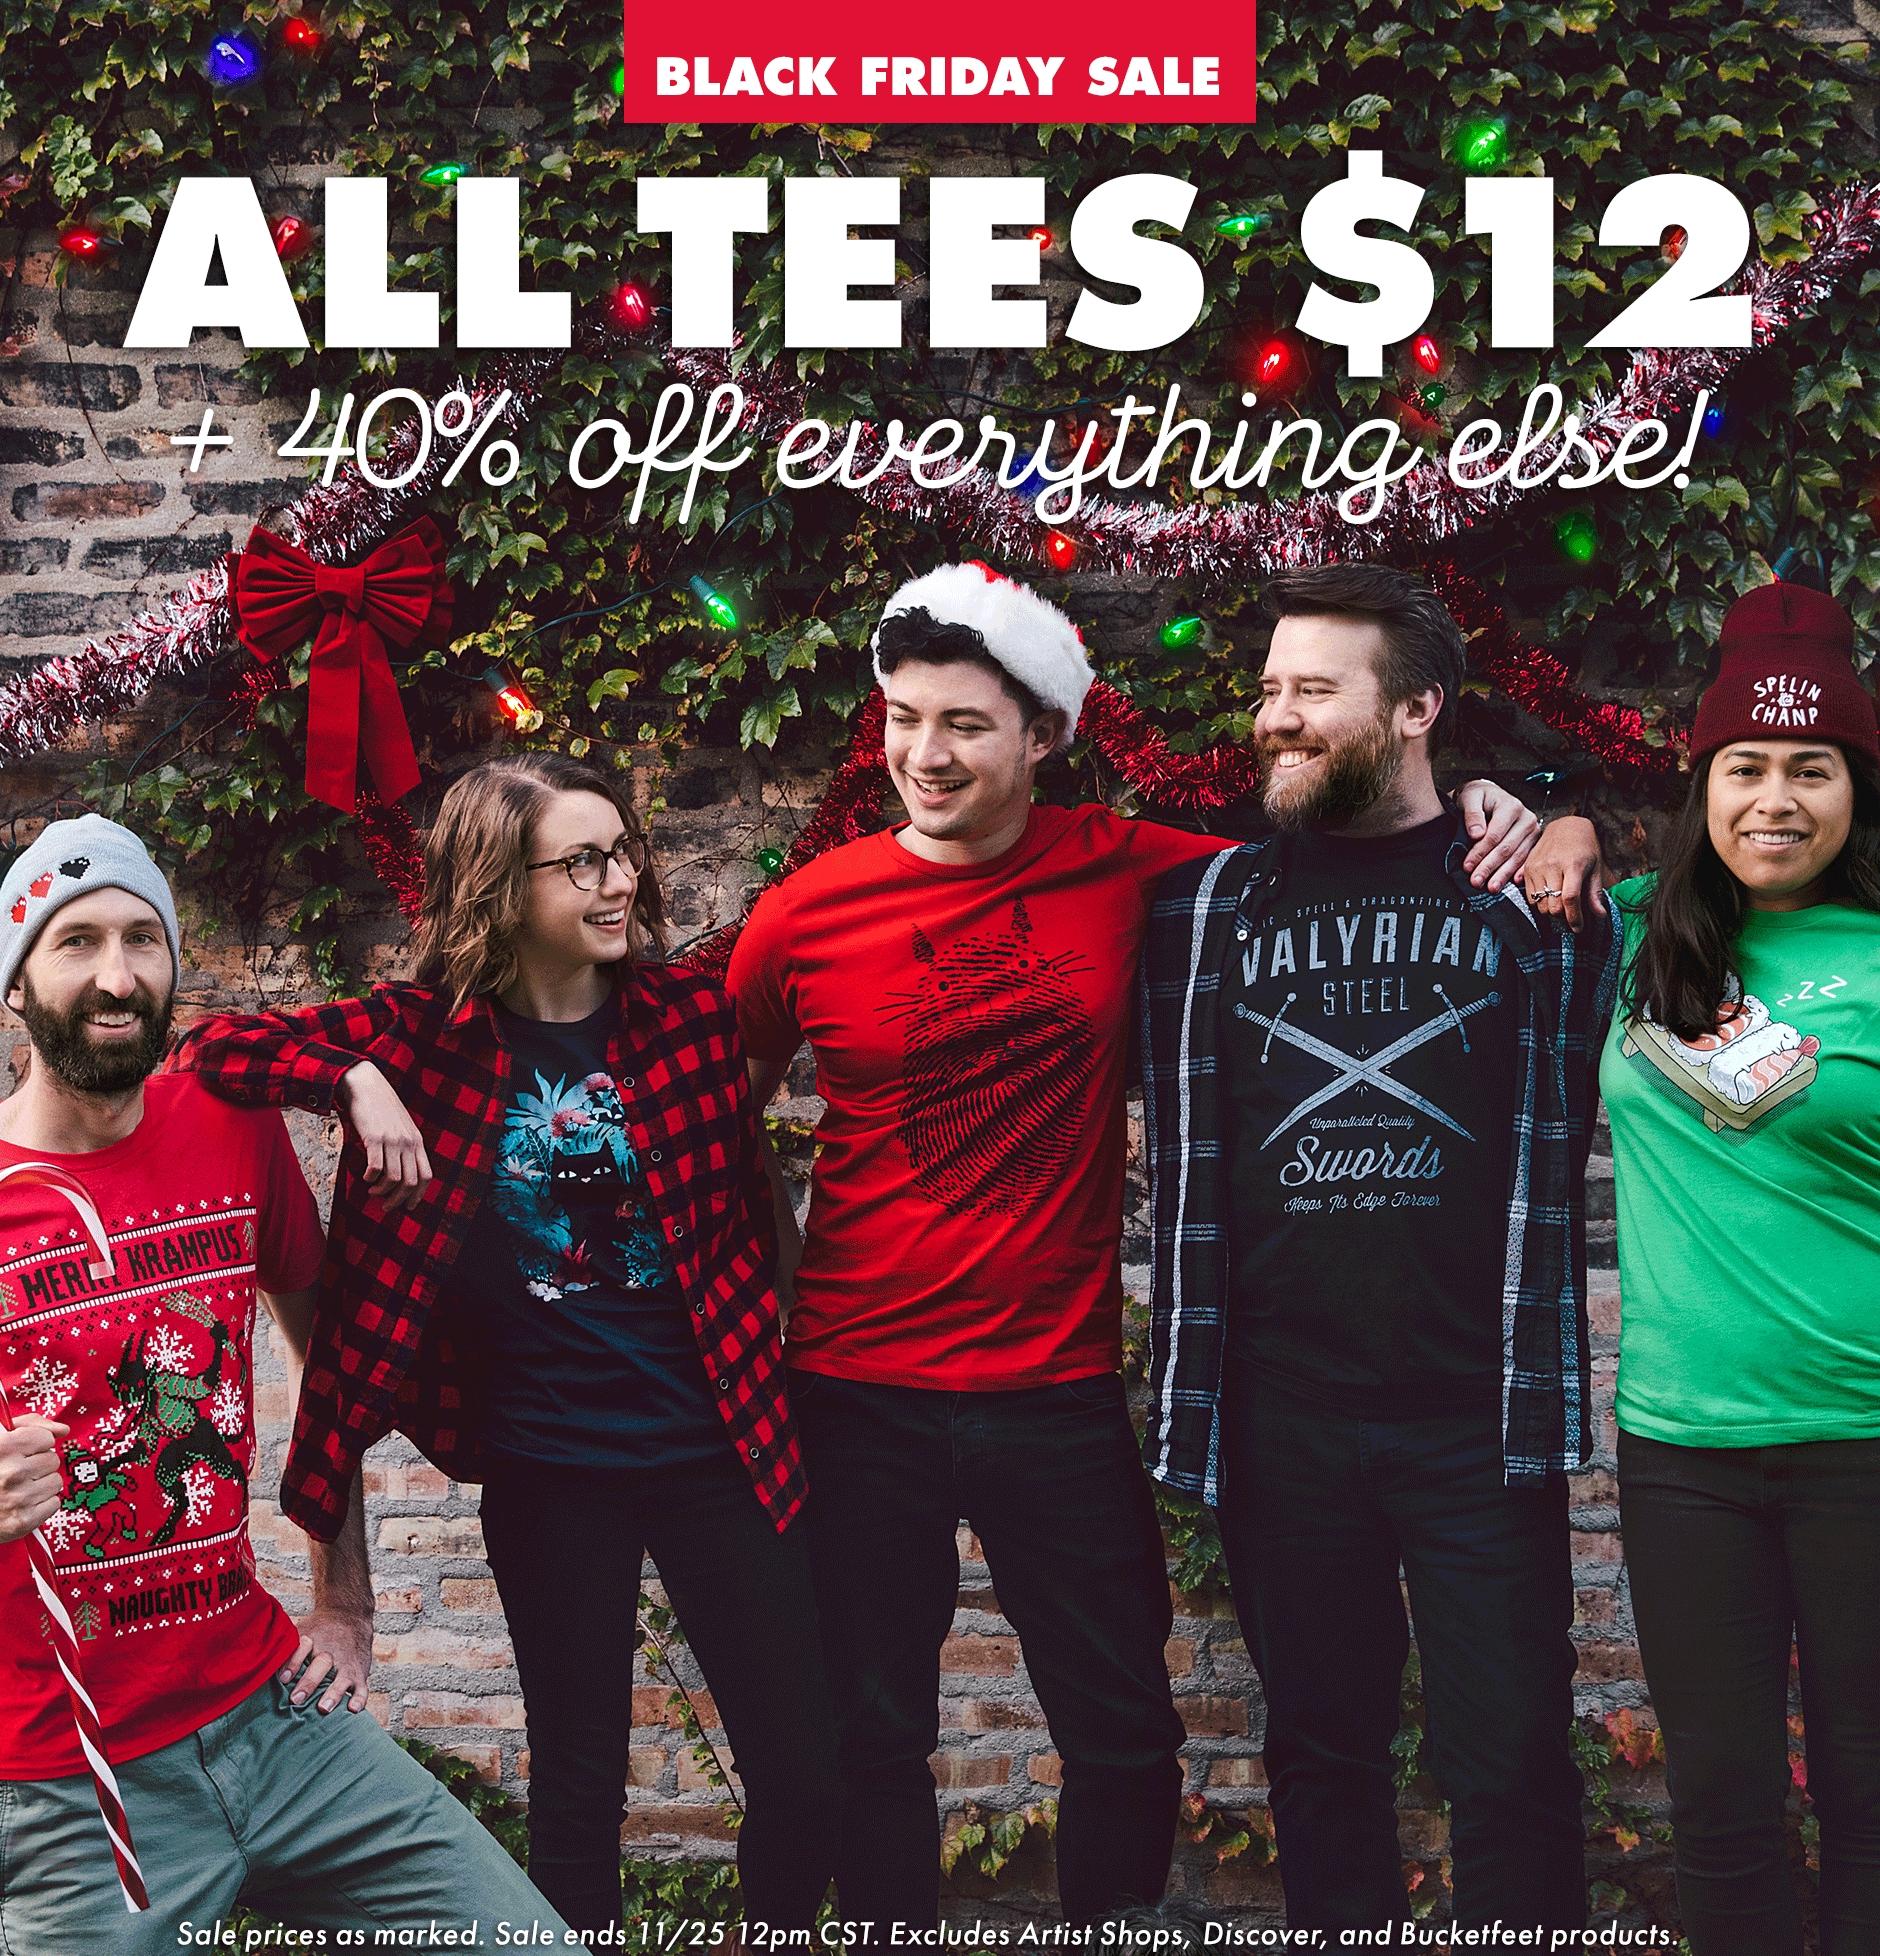 Black Friday Threadless: Jedes Shirt 12$ statt 25$, 40% Rabatt aufs restliche Sortiment